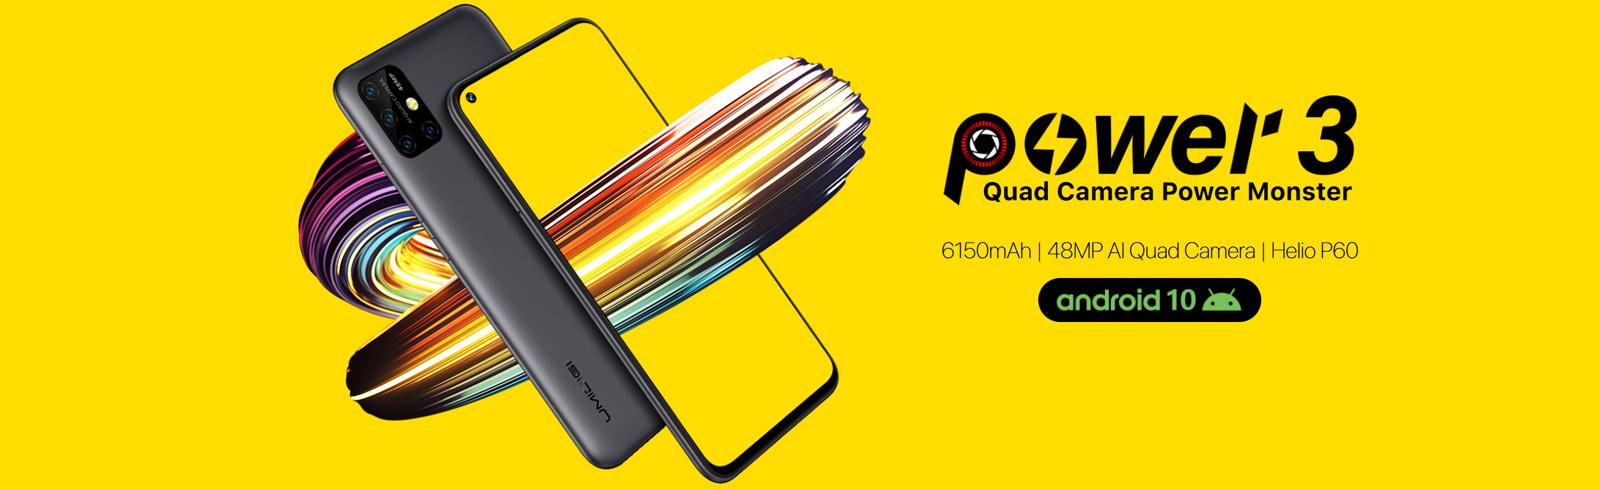 UMIDIGI Power 3 goes official with a 6150 mAh battery, Helio P60 chipset, quad rear cameras